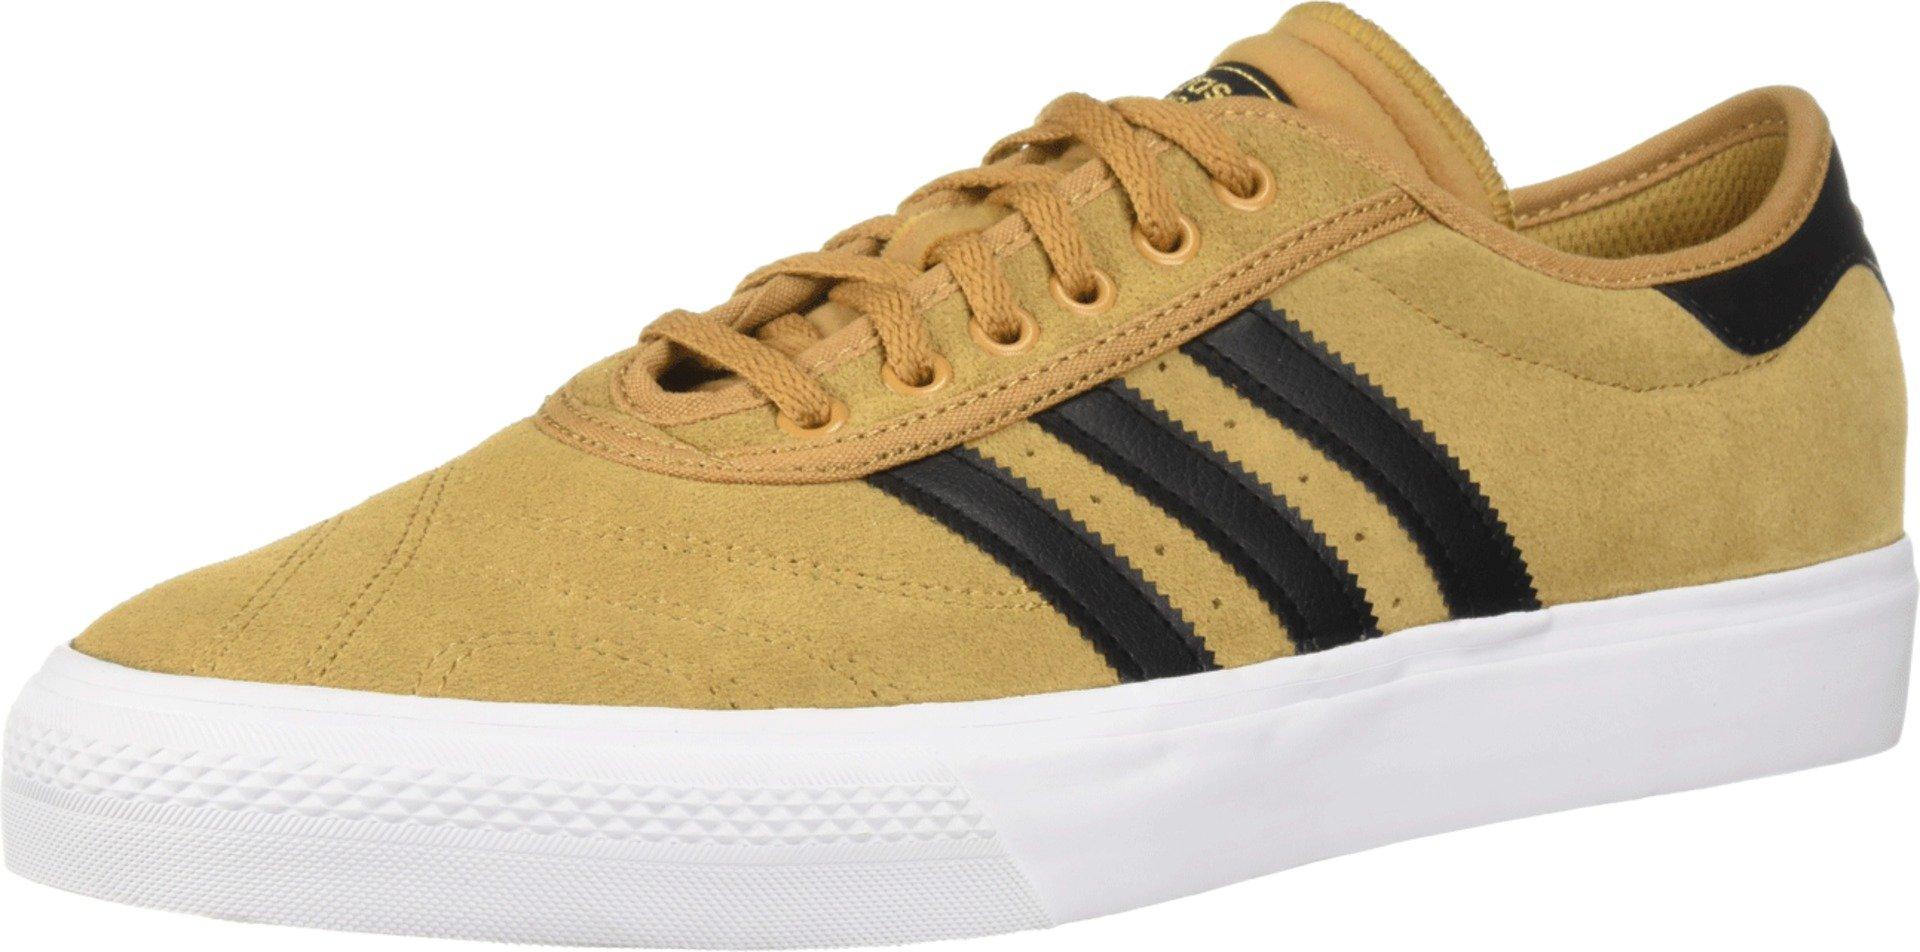 sale retailer 99544 e11d8 Galleon - Adidas Skateboarding Men s Adi-Ease Premiere Mesa Core Black Footwear  White 8 D US D (M)